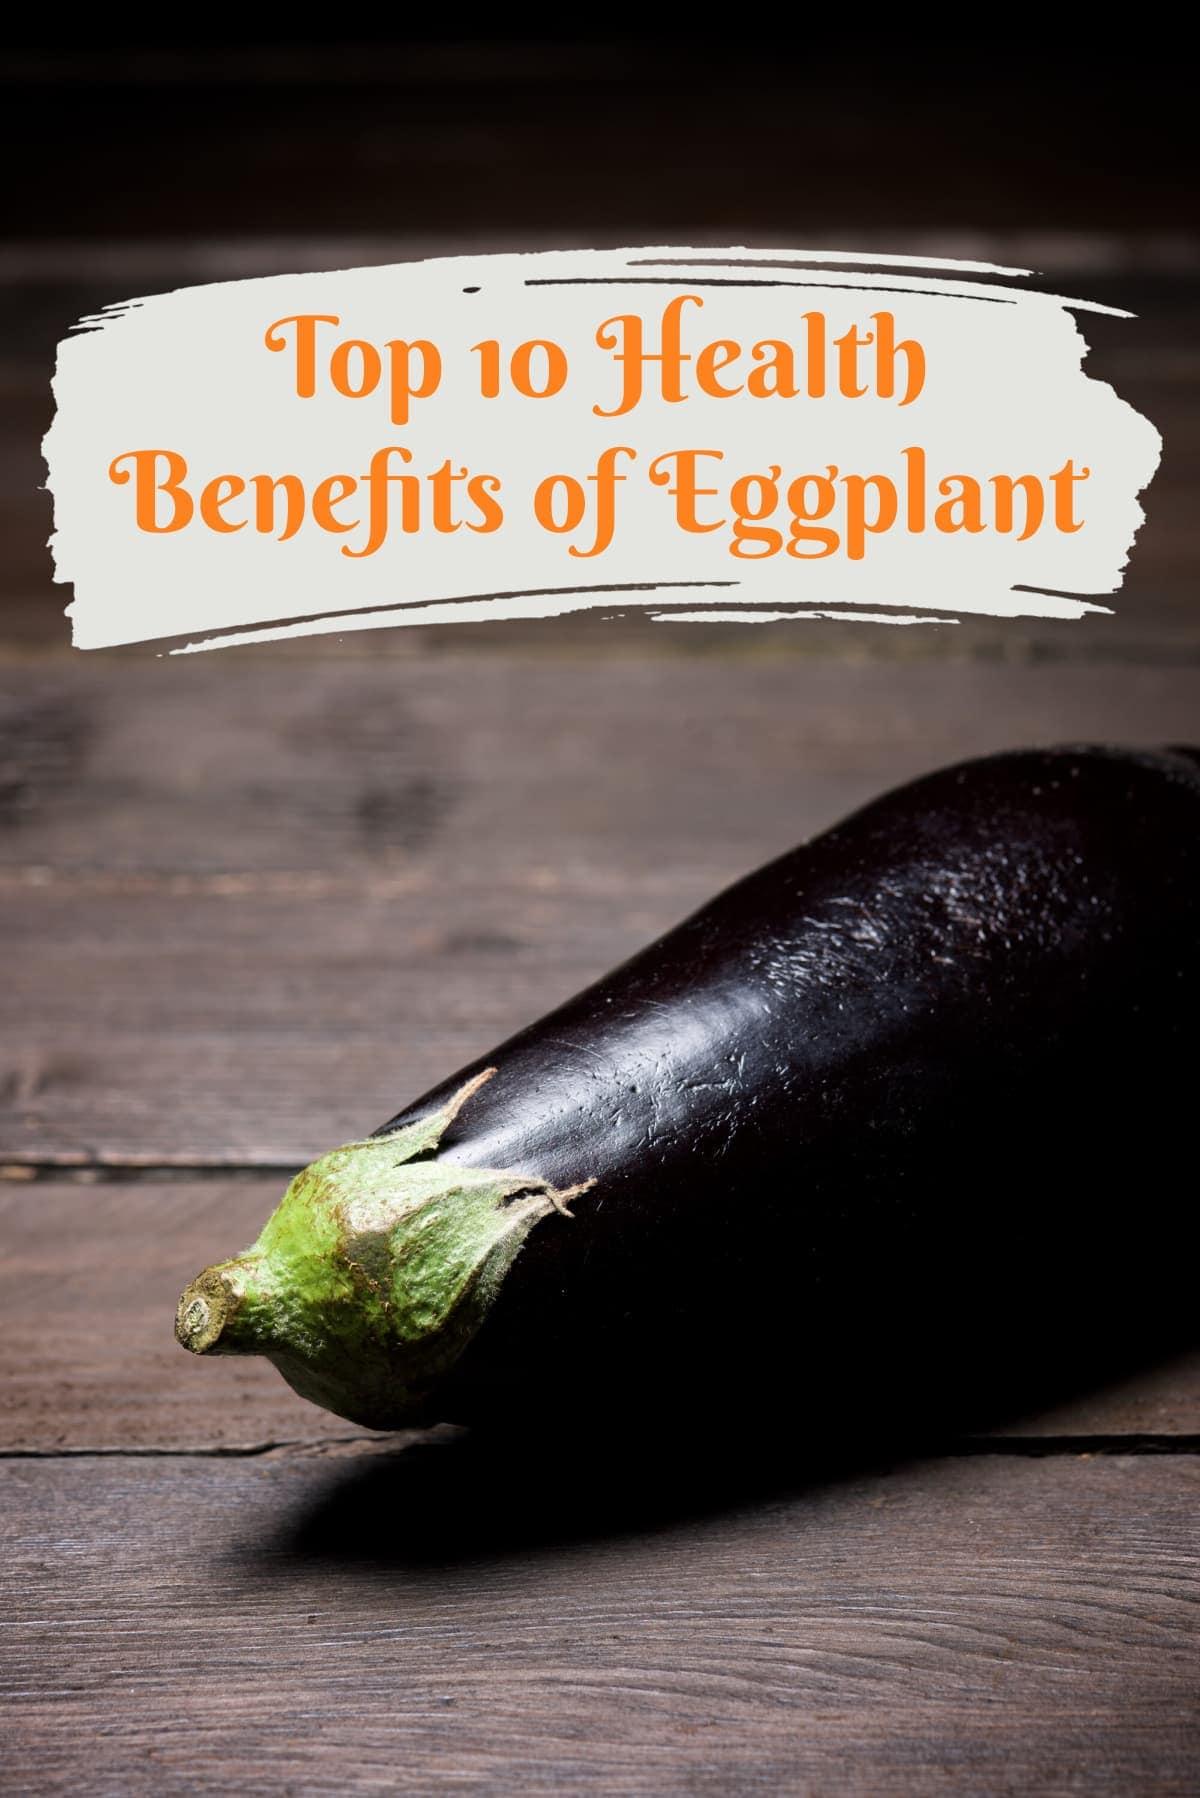 Top 10 Health Benefits of Eggplants